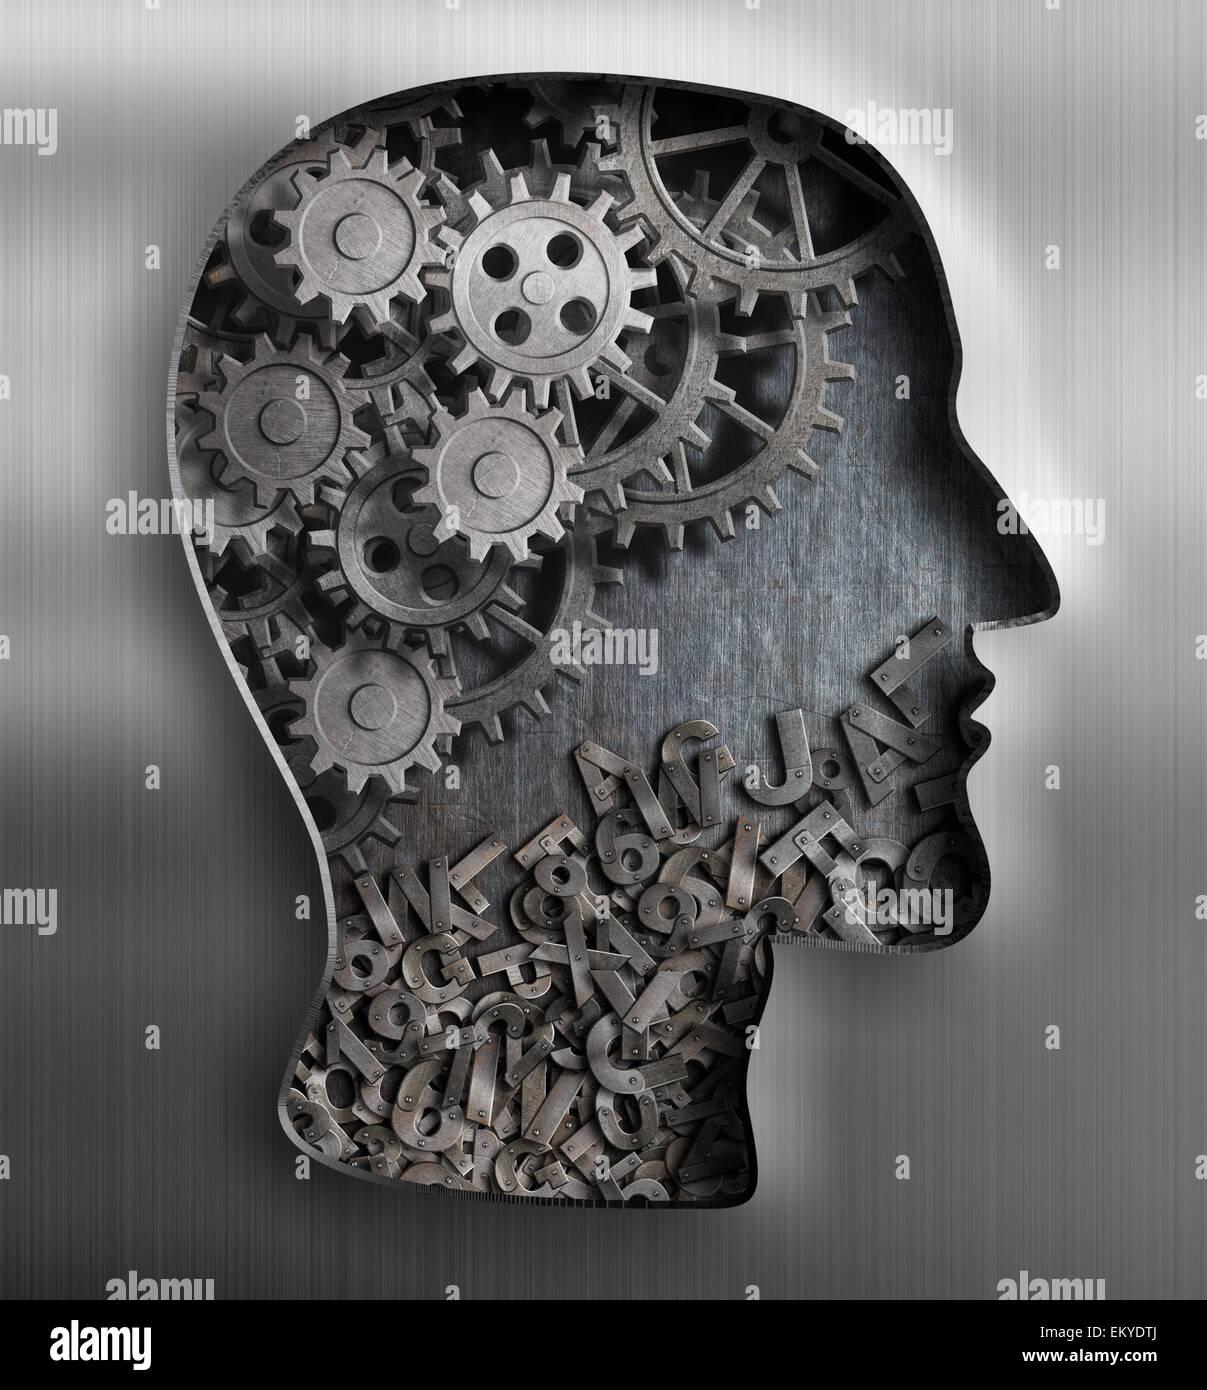 Metall-Gehirn. Denken, Psychologie, Kreativität, Sprache-Konzept. Stockbild